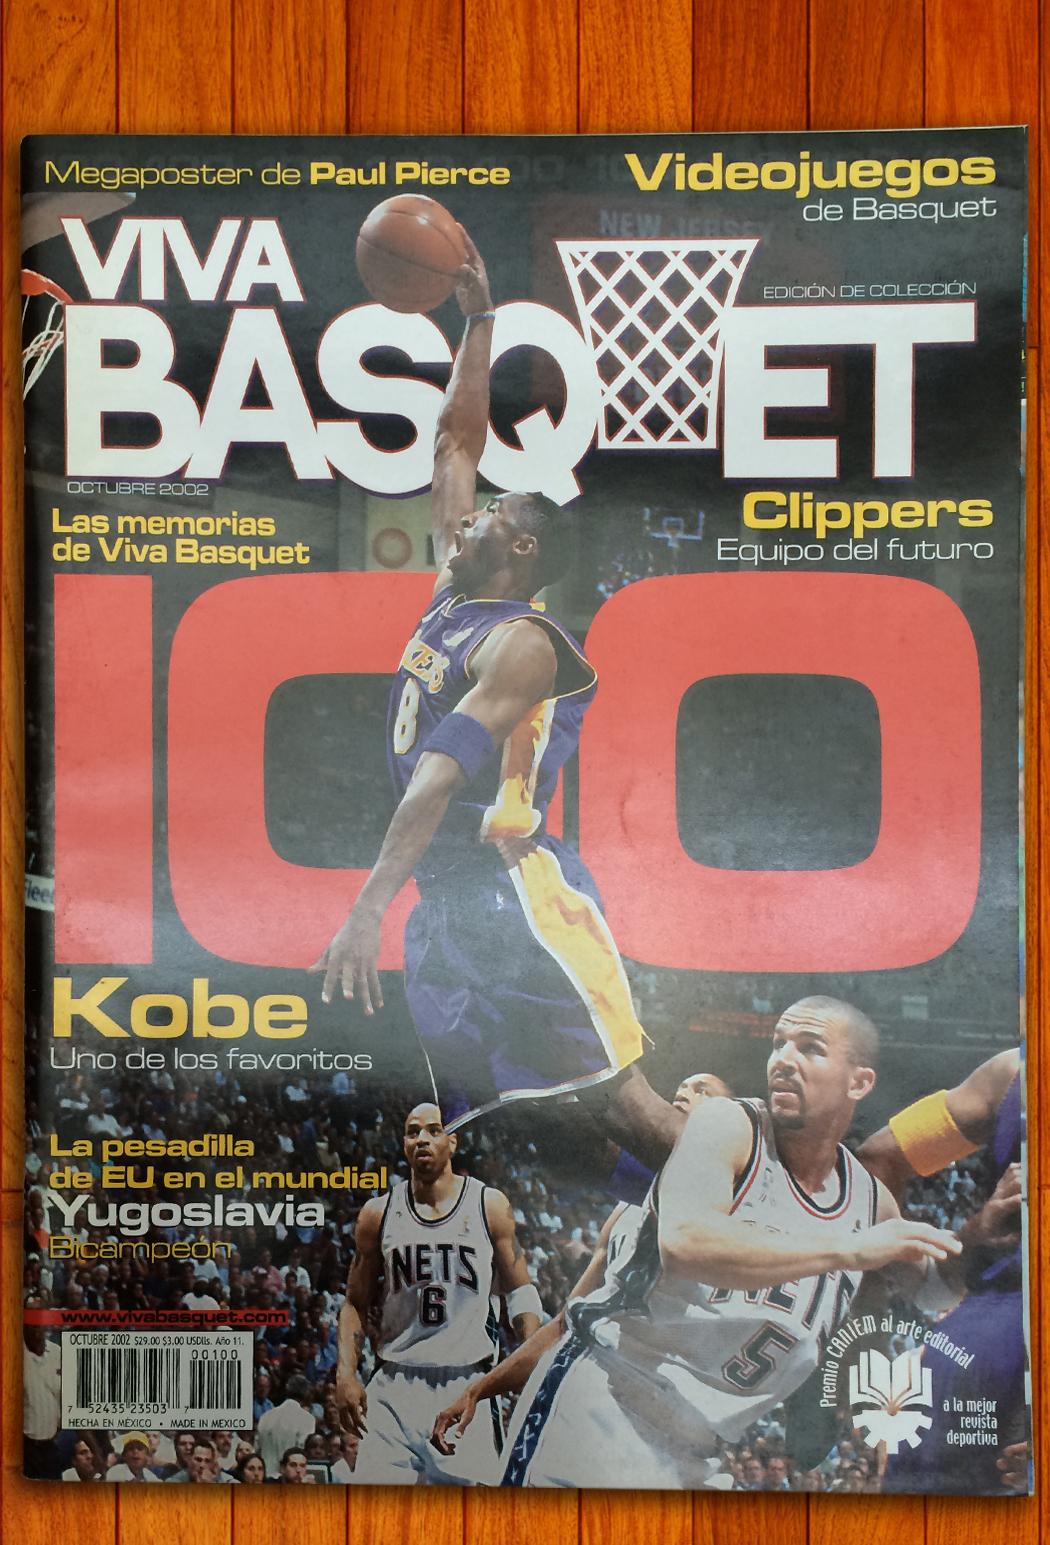 Kobe Bryant en viva basquet foto 4